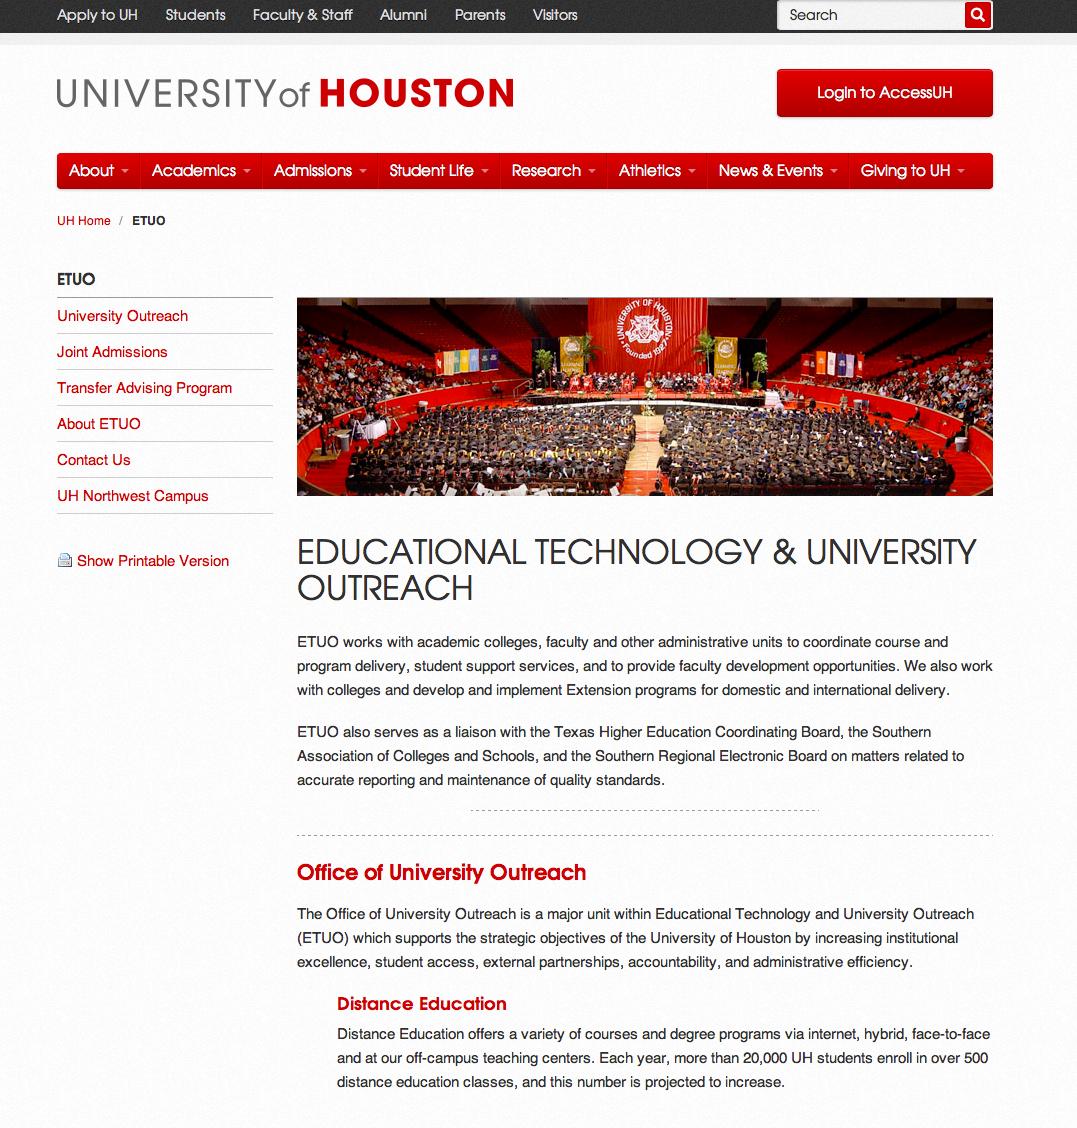 University of Houston ETUO